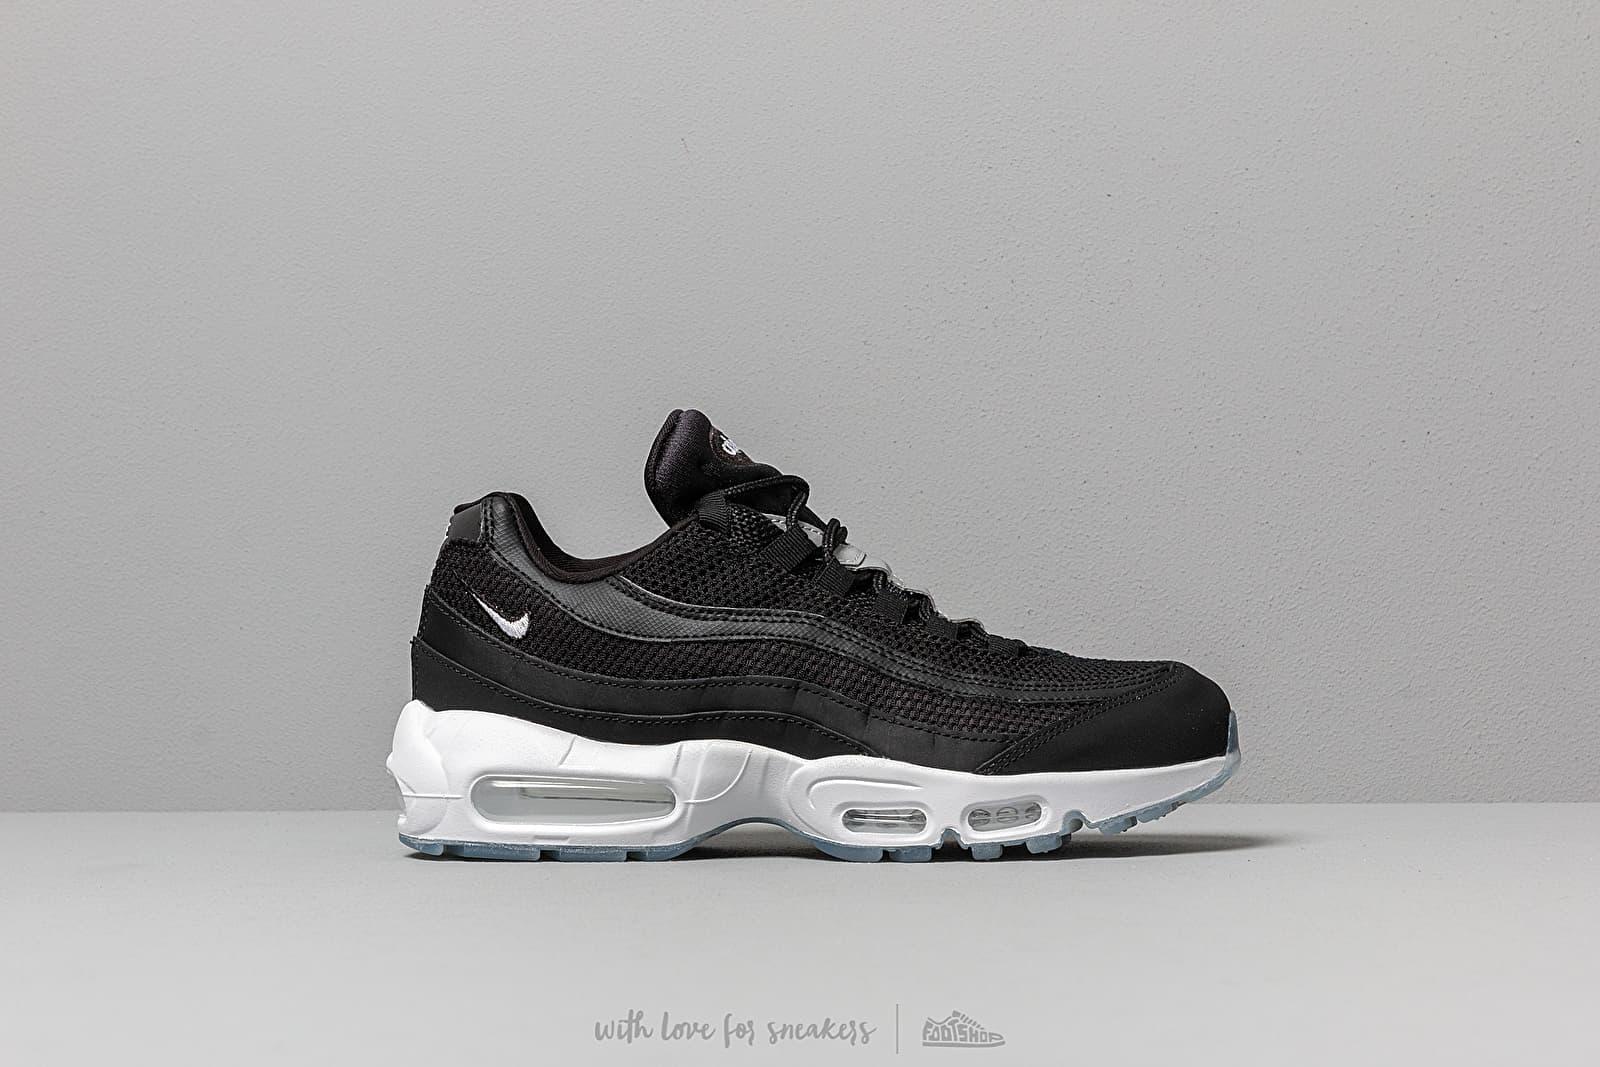 Nike Air Max 95 Essential Black White Black Reflect Silver | Footshop